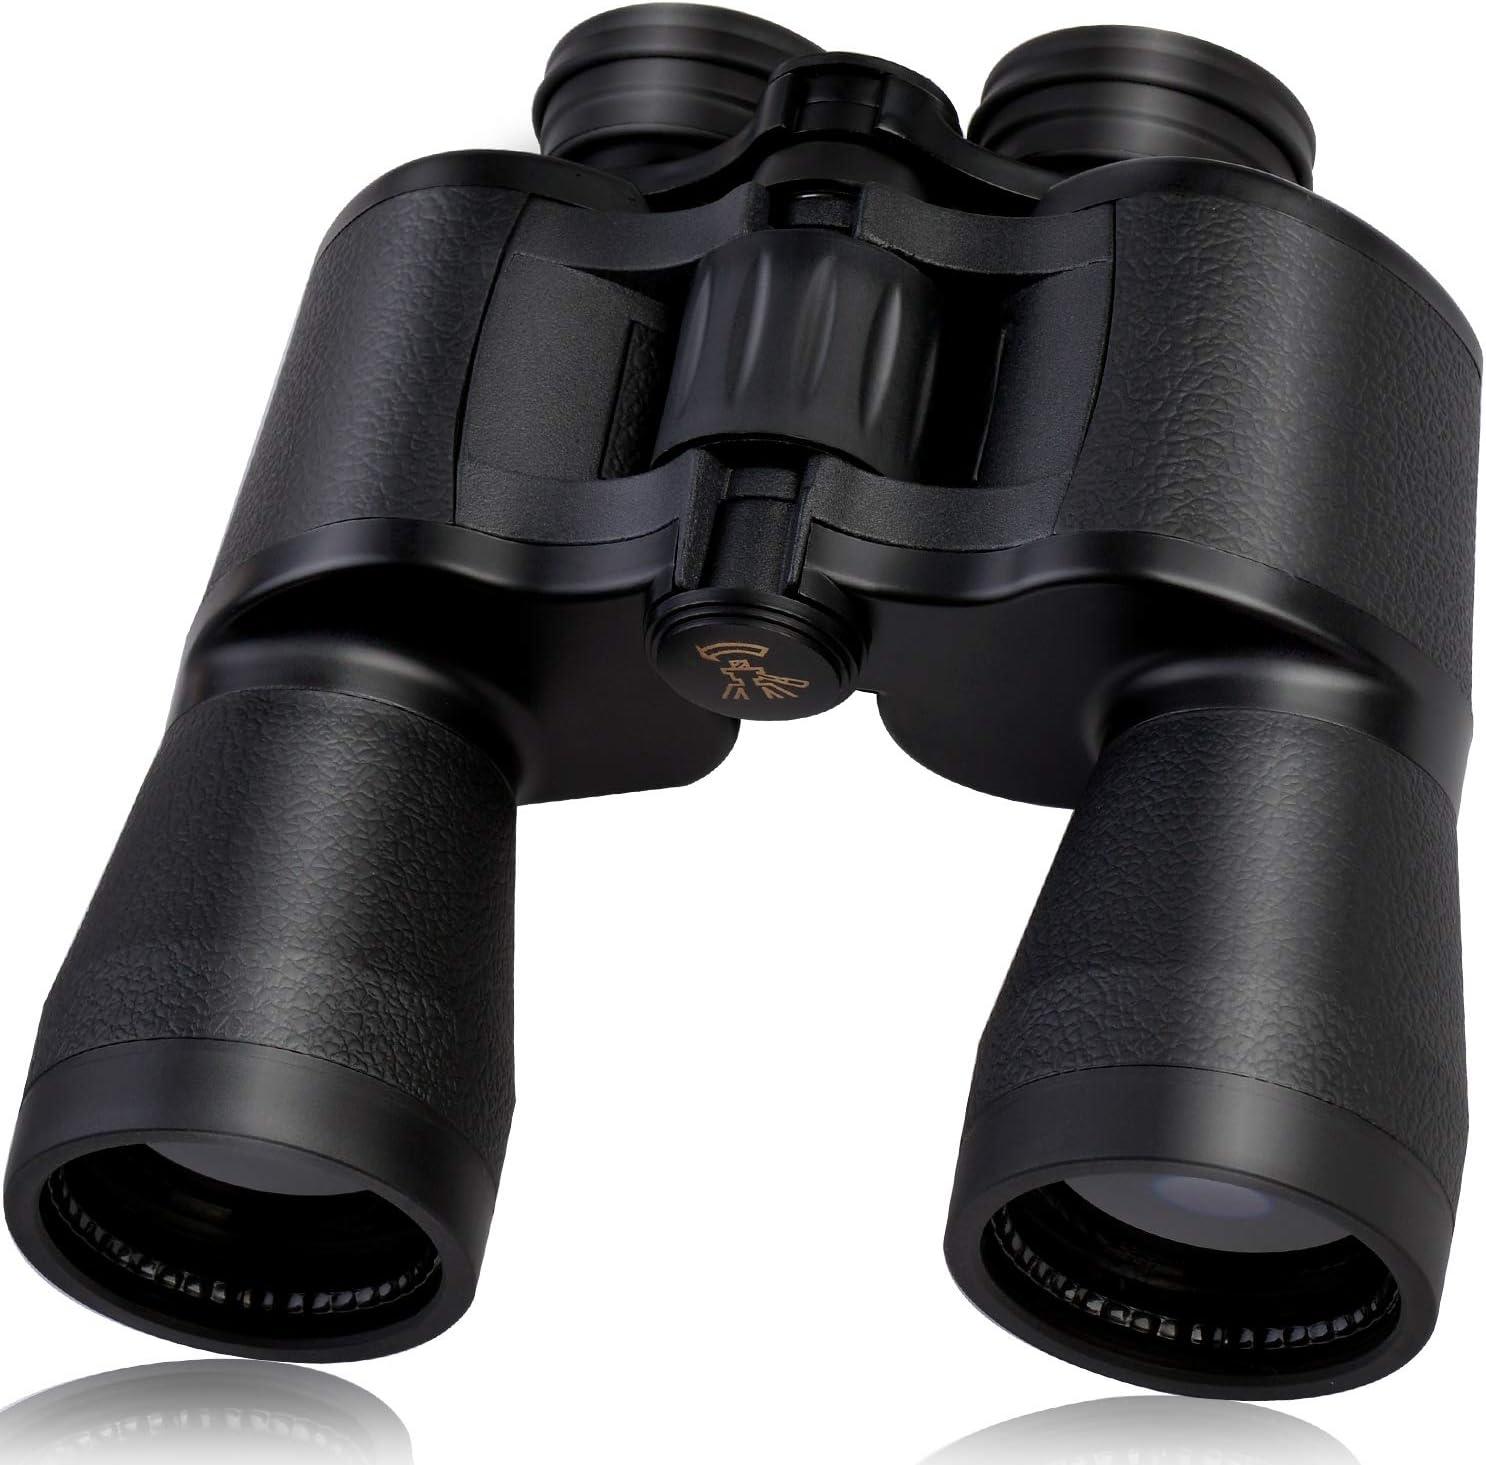 Binoculars Black Friday & Cyber Monday [year] - 70% OFF 9